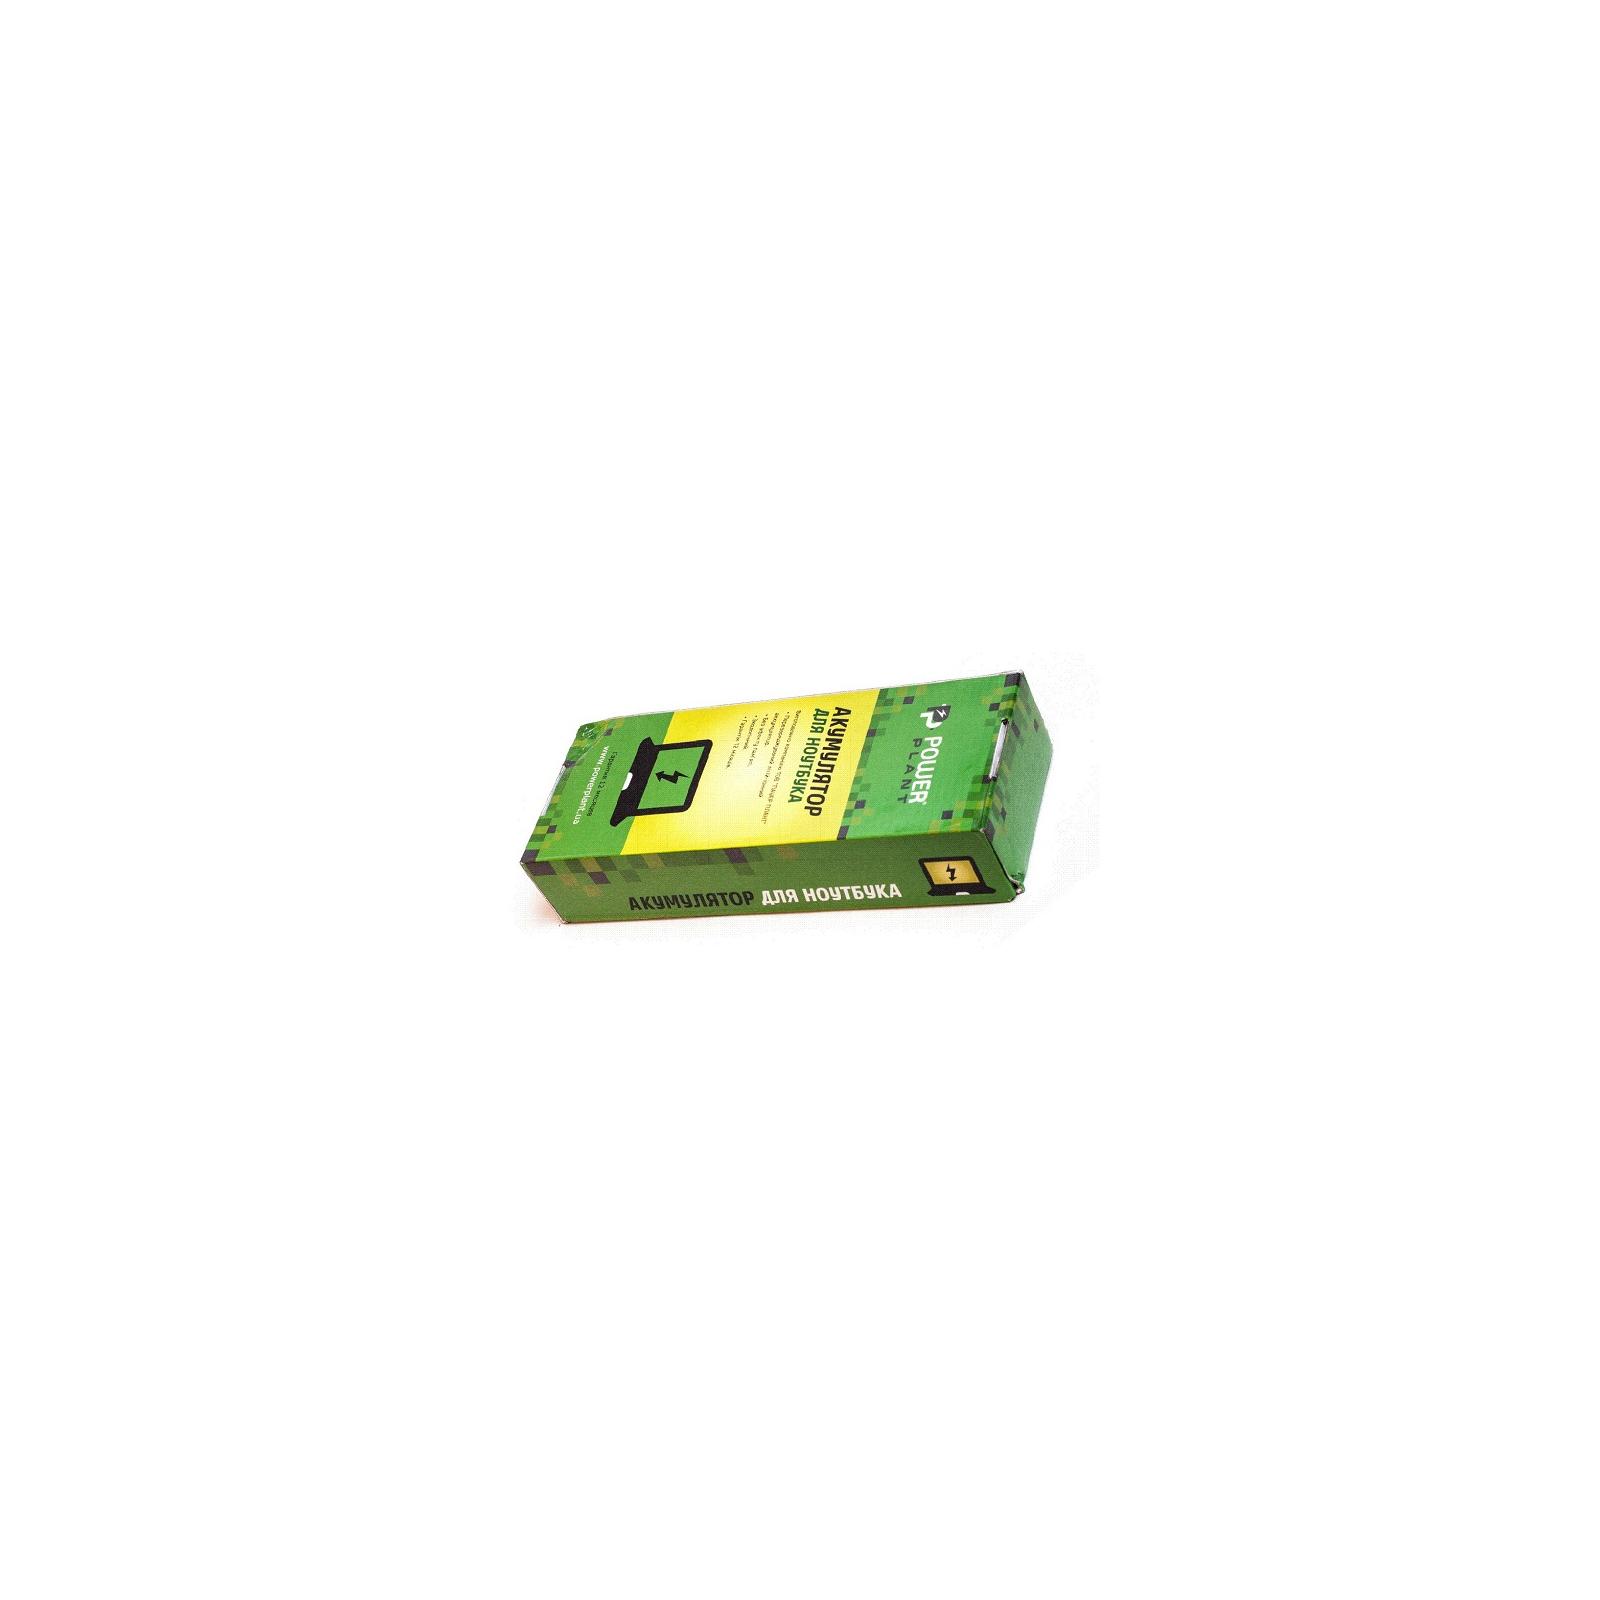 Аккумулятор для ноутбука LENOVO 3000 (FRU 92P1186, LE N100 3S2P) 10.8V 5200mAh PowerPlant (NB00000032) изображение 3